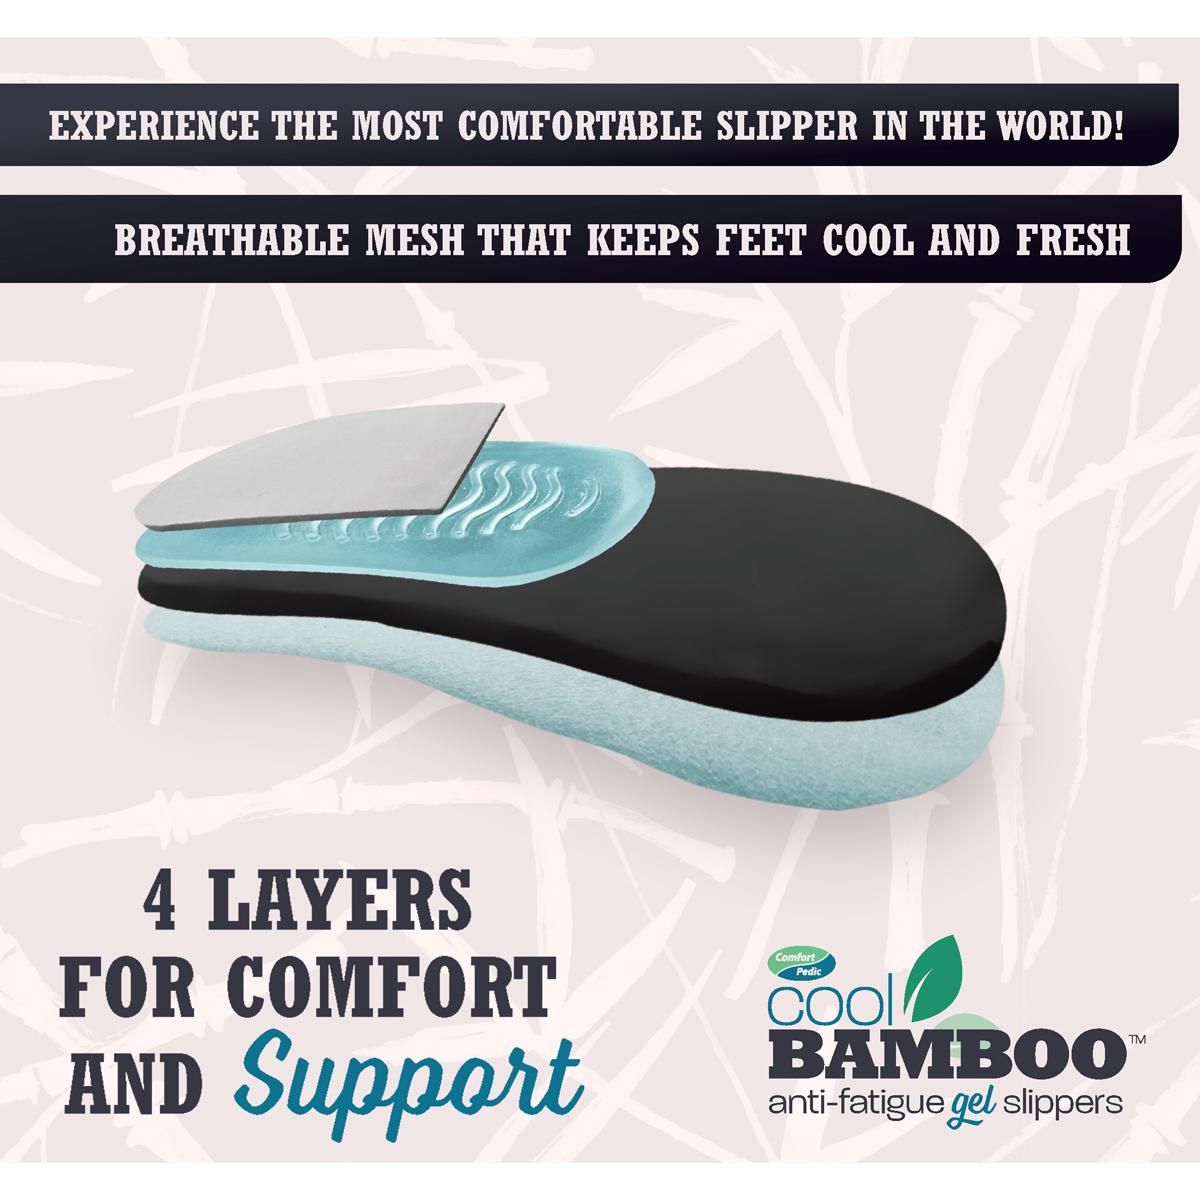 Cool Bamboo Anti-Fatigue Gel Slippers